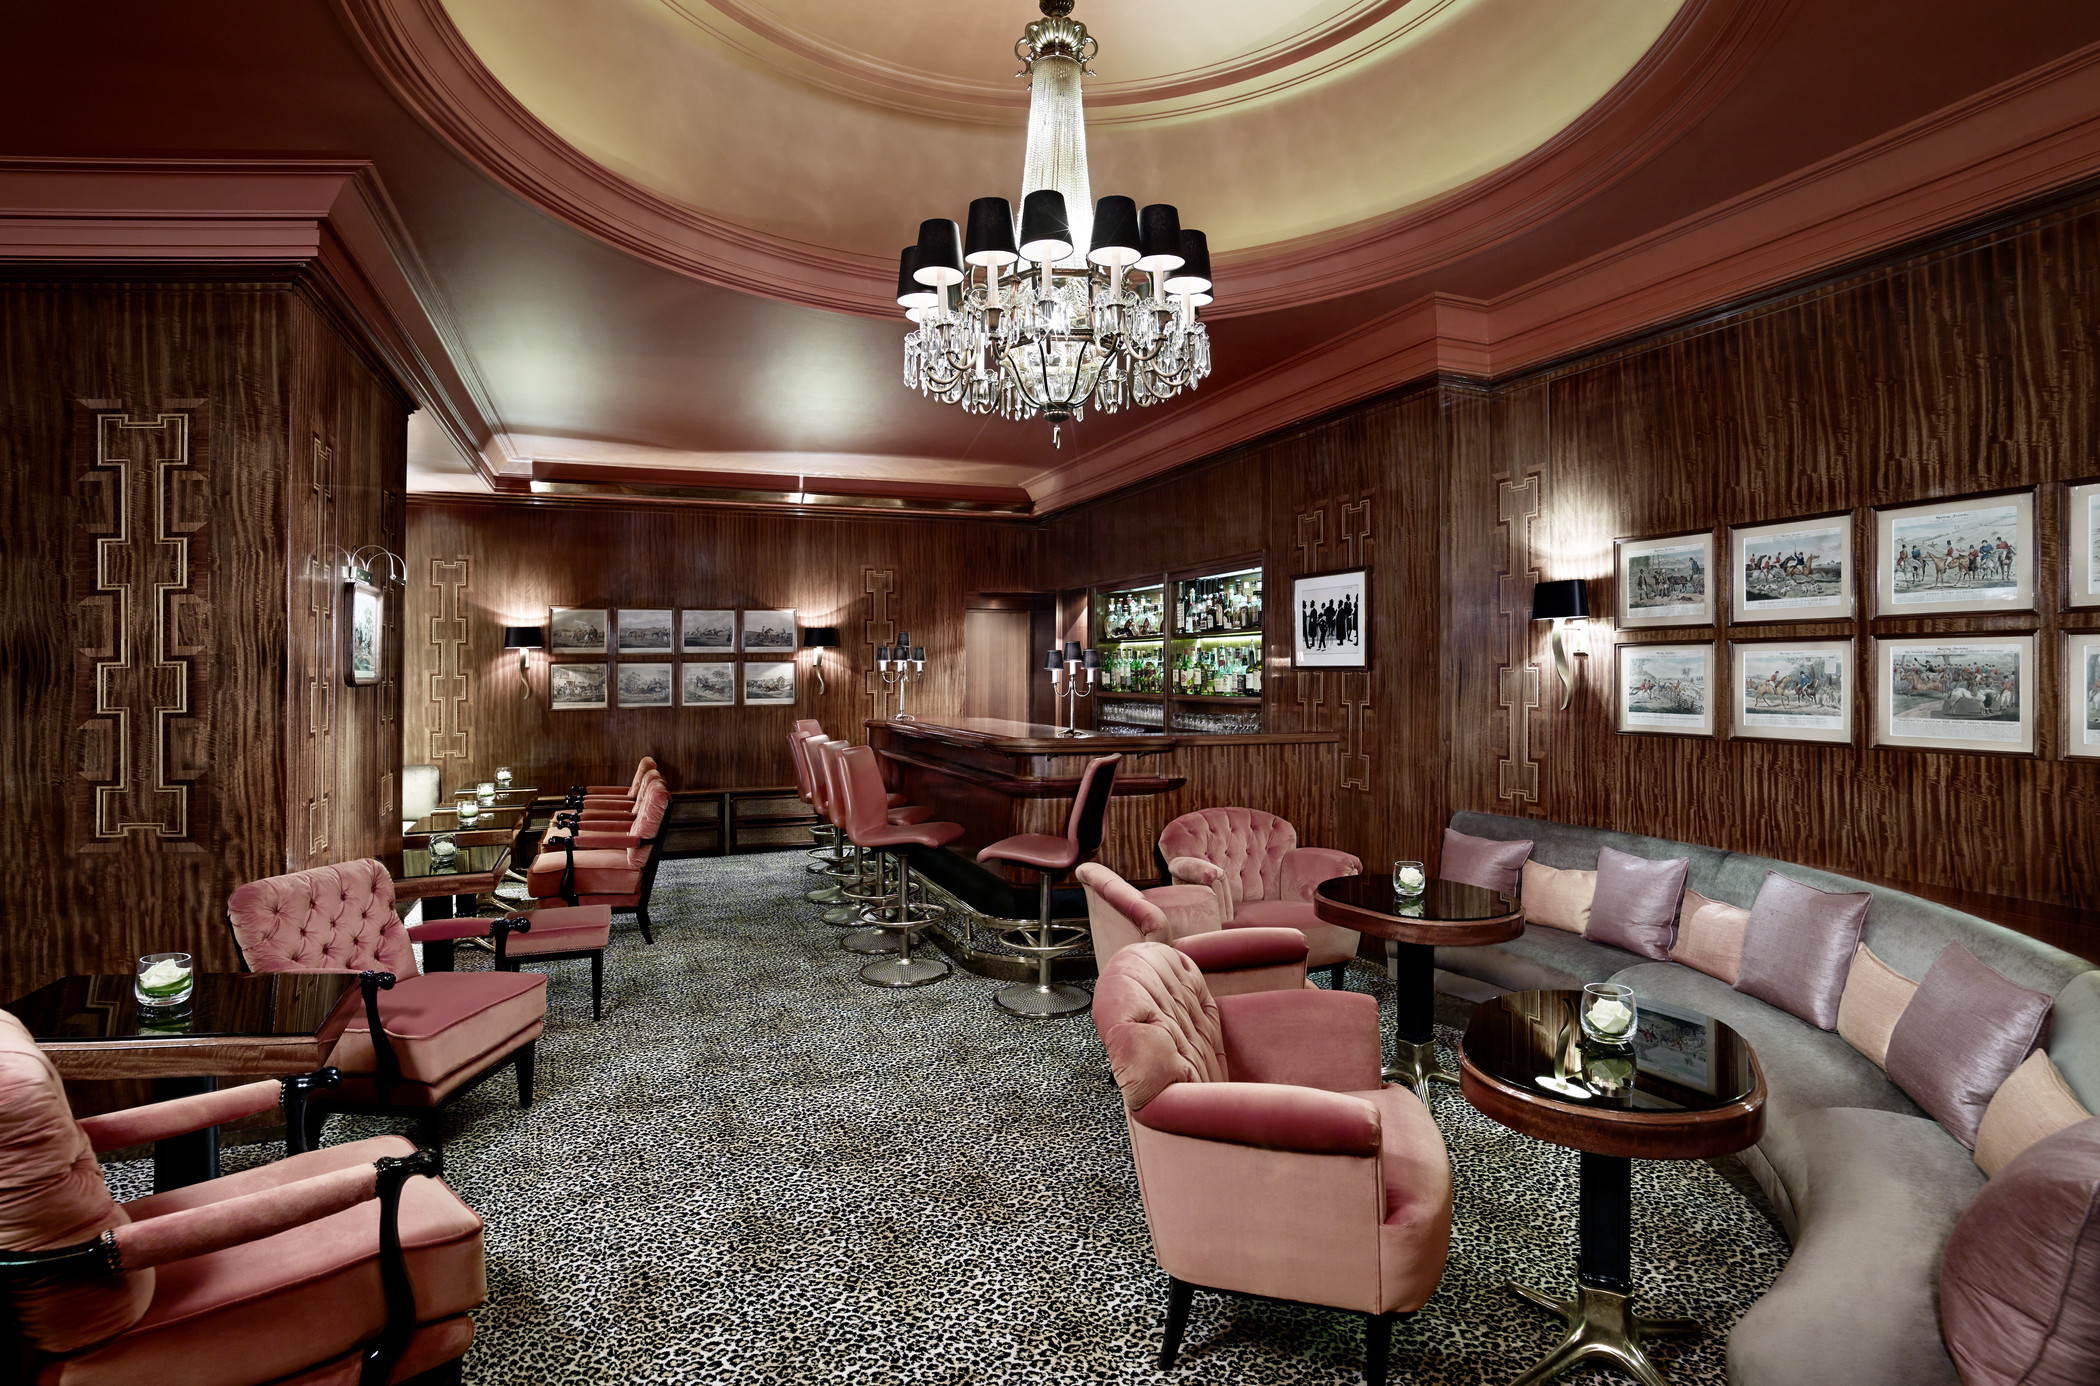 SA - Hotel Bristol Vienna - 7.jpg